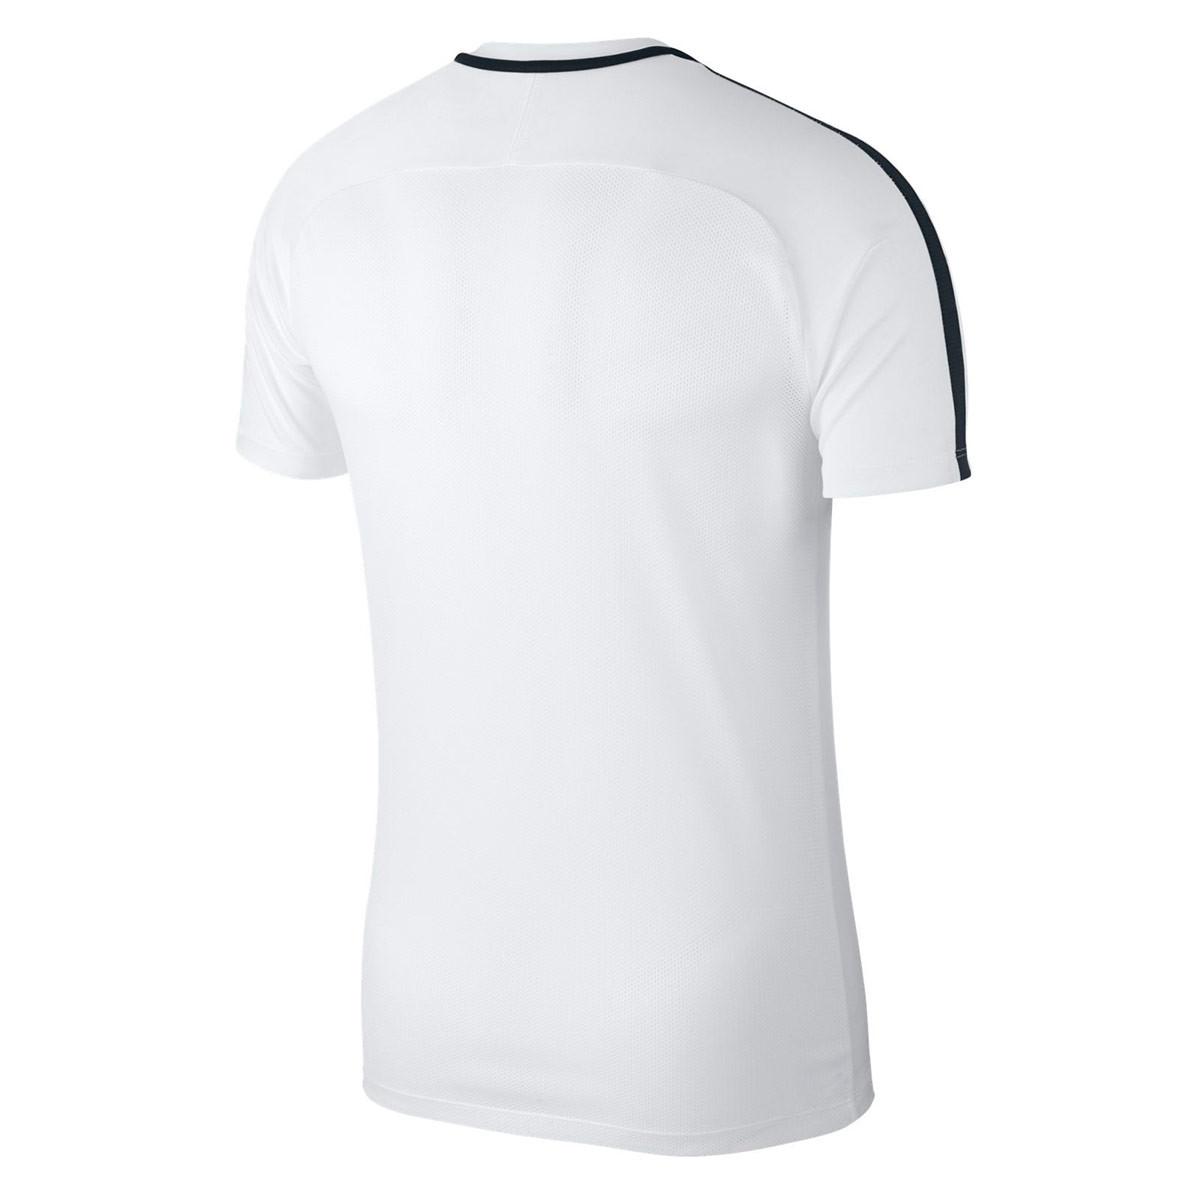 Jersey Nike Dry Academy 18 Niño White-Black - Leaked soccer b0e2d57acf55d